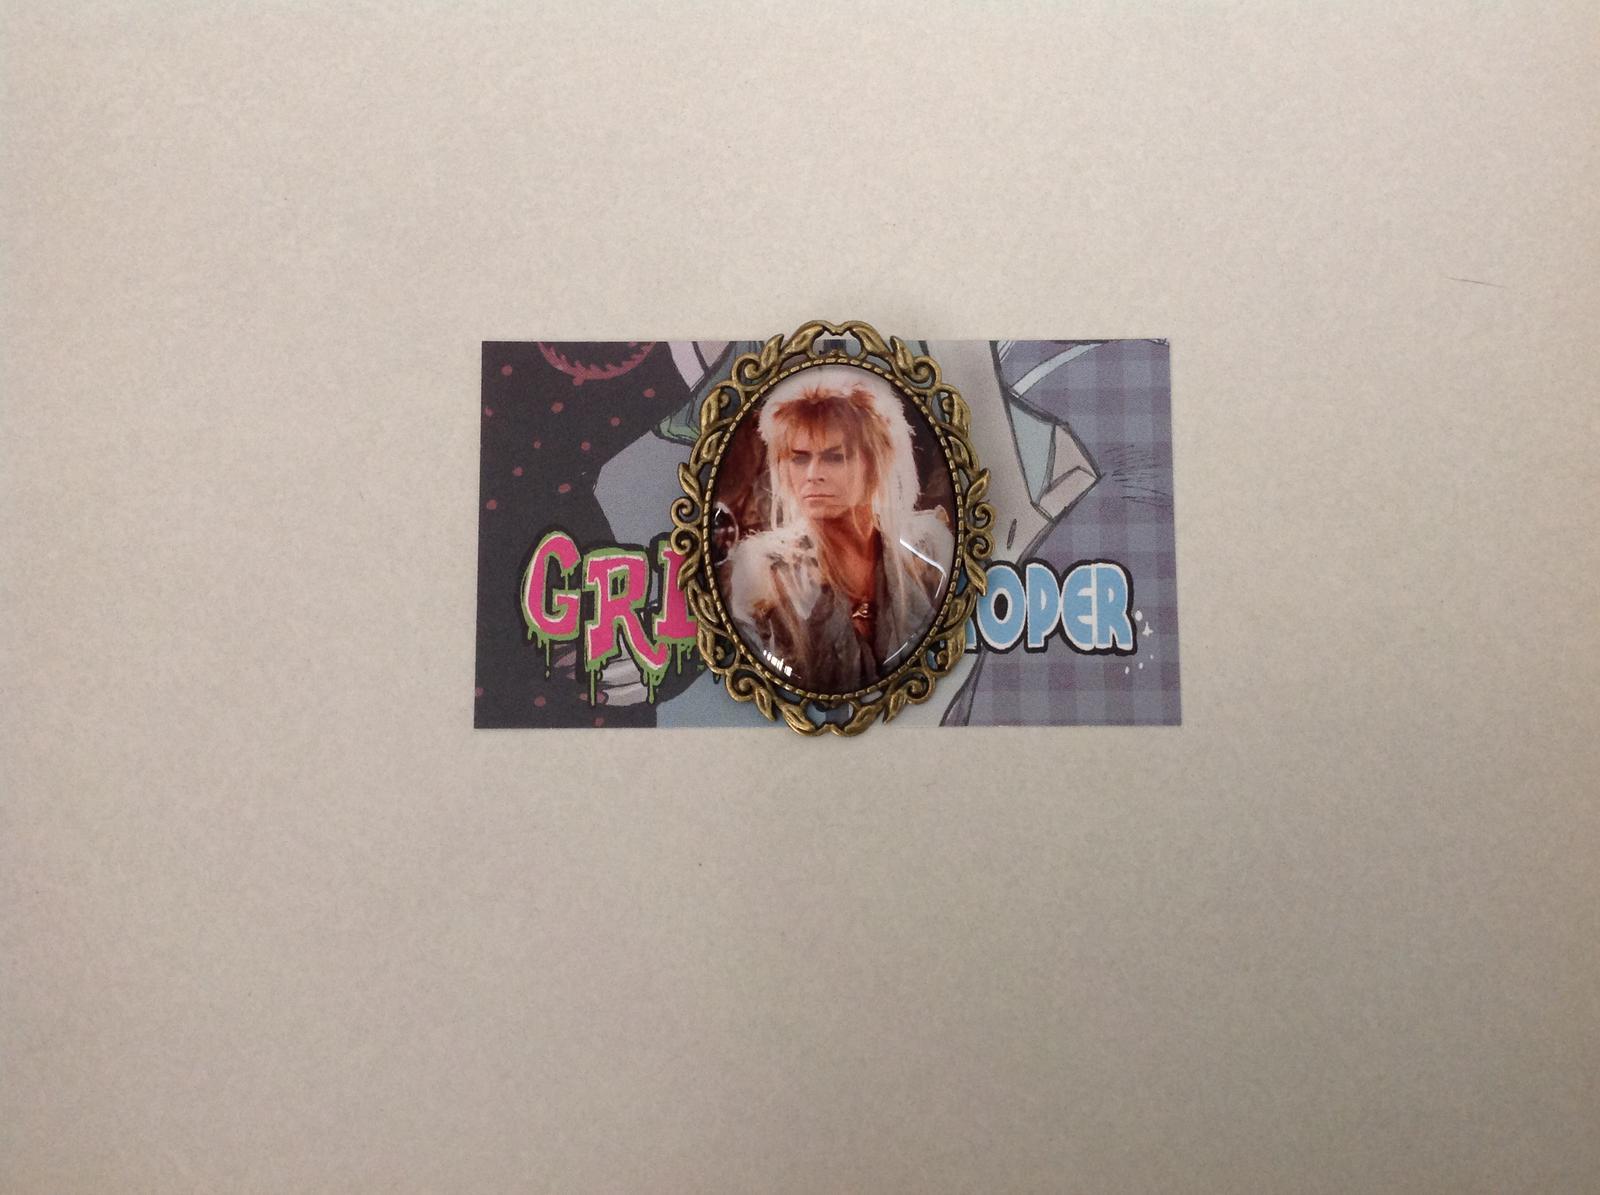 David Bowie The Labyrinth brooch